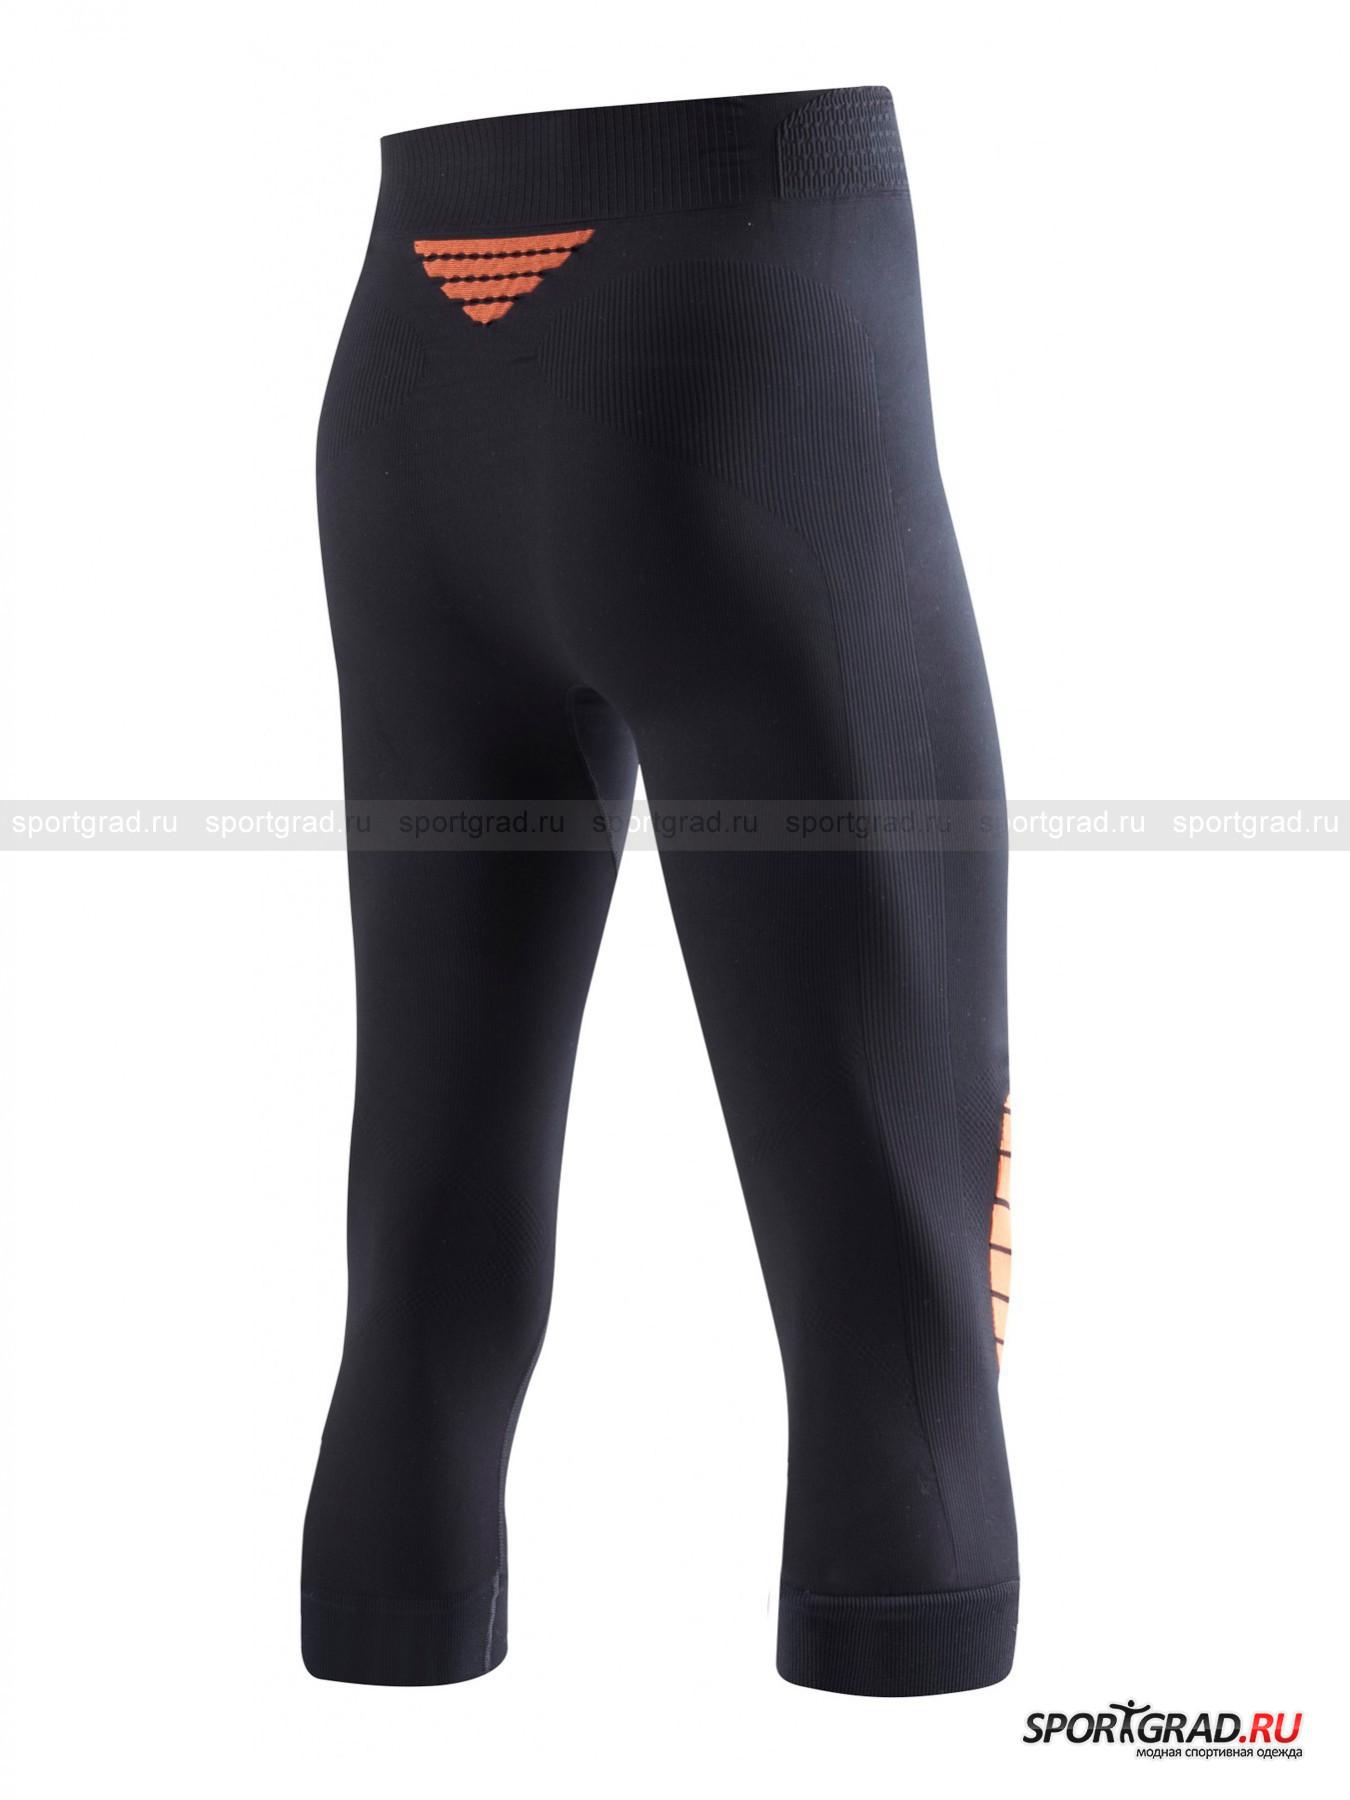 Белье: термобриджи мужские Pants Med Energ X-BIONIC для занятий спортом от Спортград